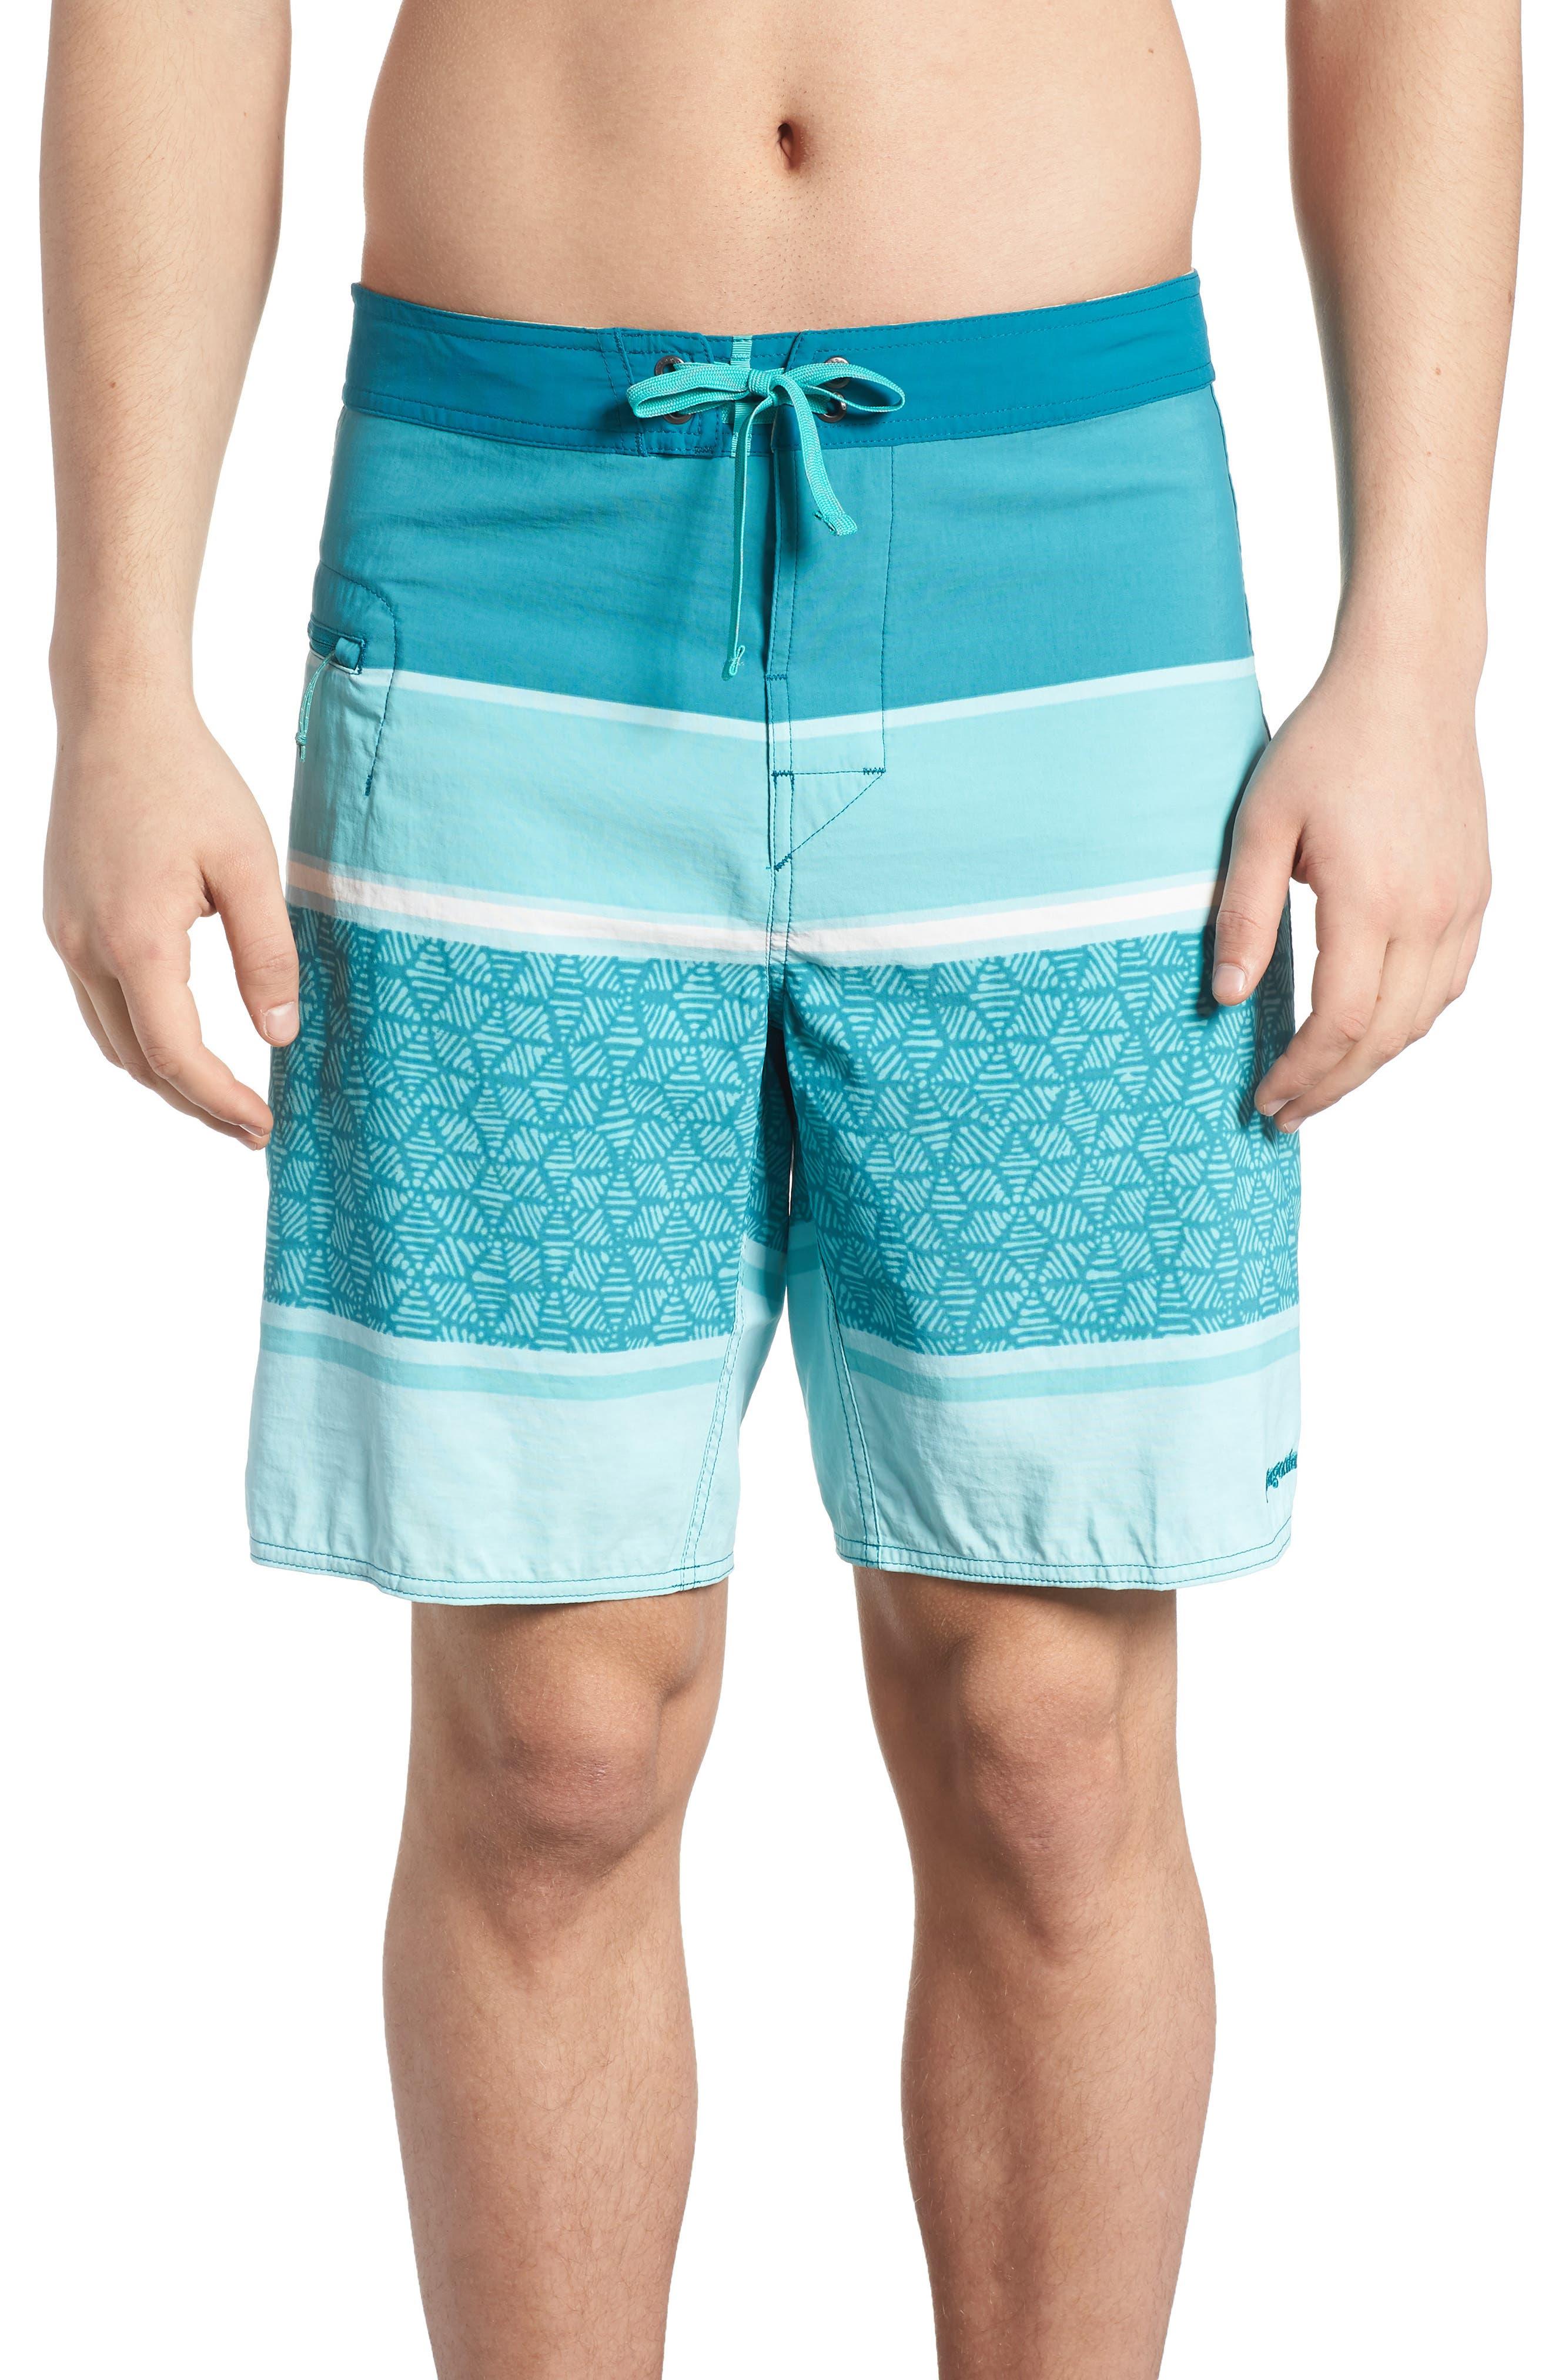 Wavefarer Board Shorts,                             Main thumbnail 1, color,                             BATIK HEX STRIPE BEND BLUE